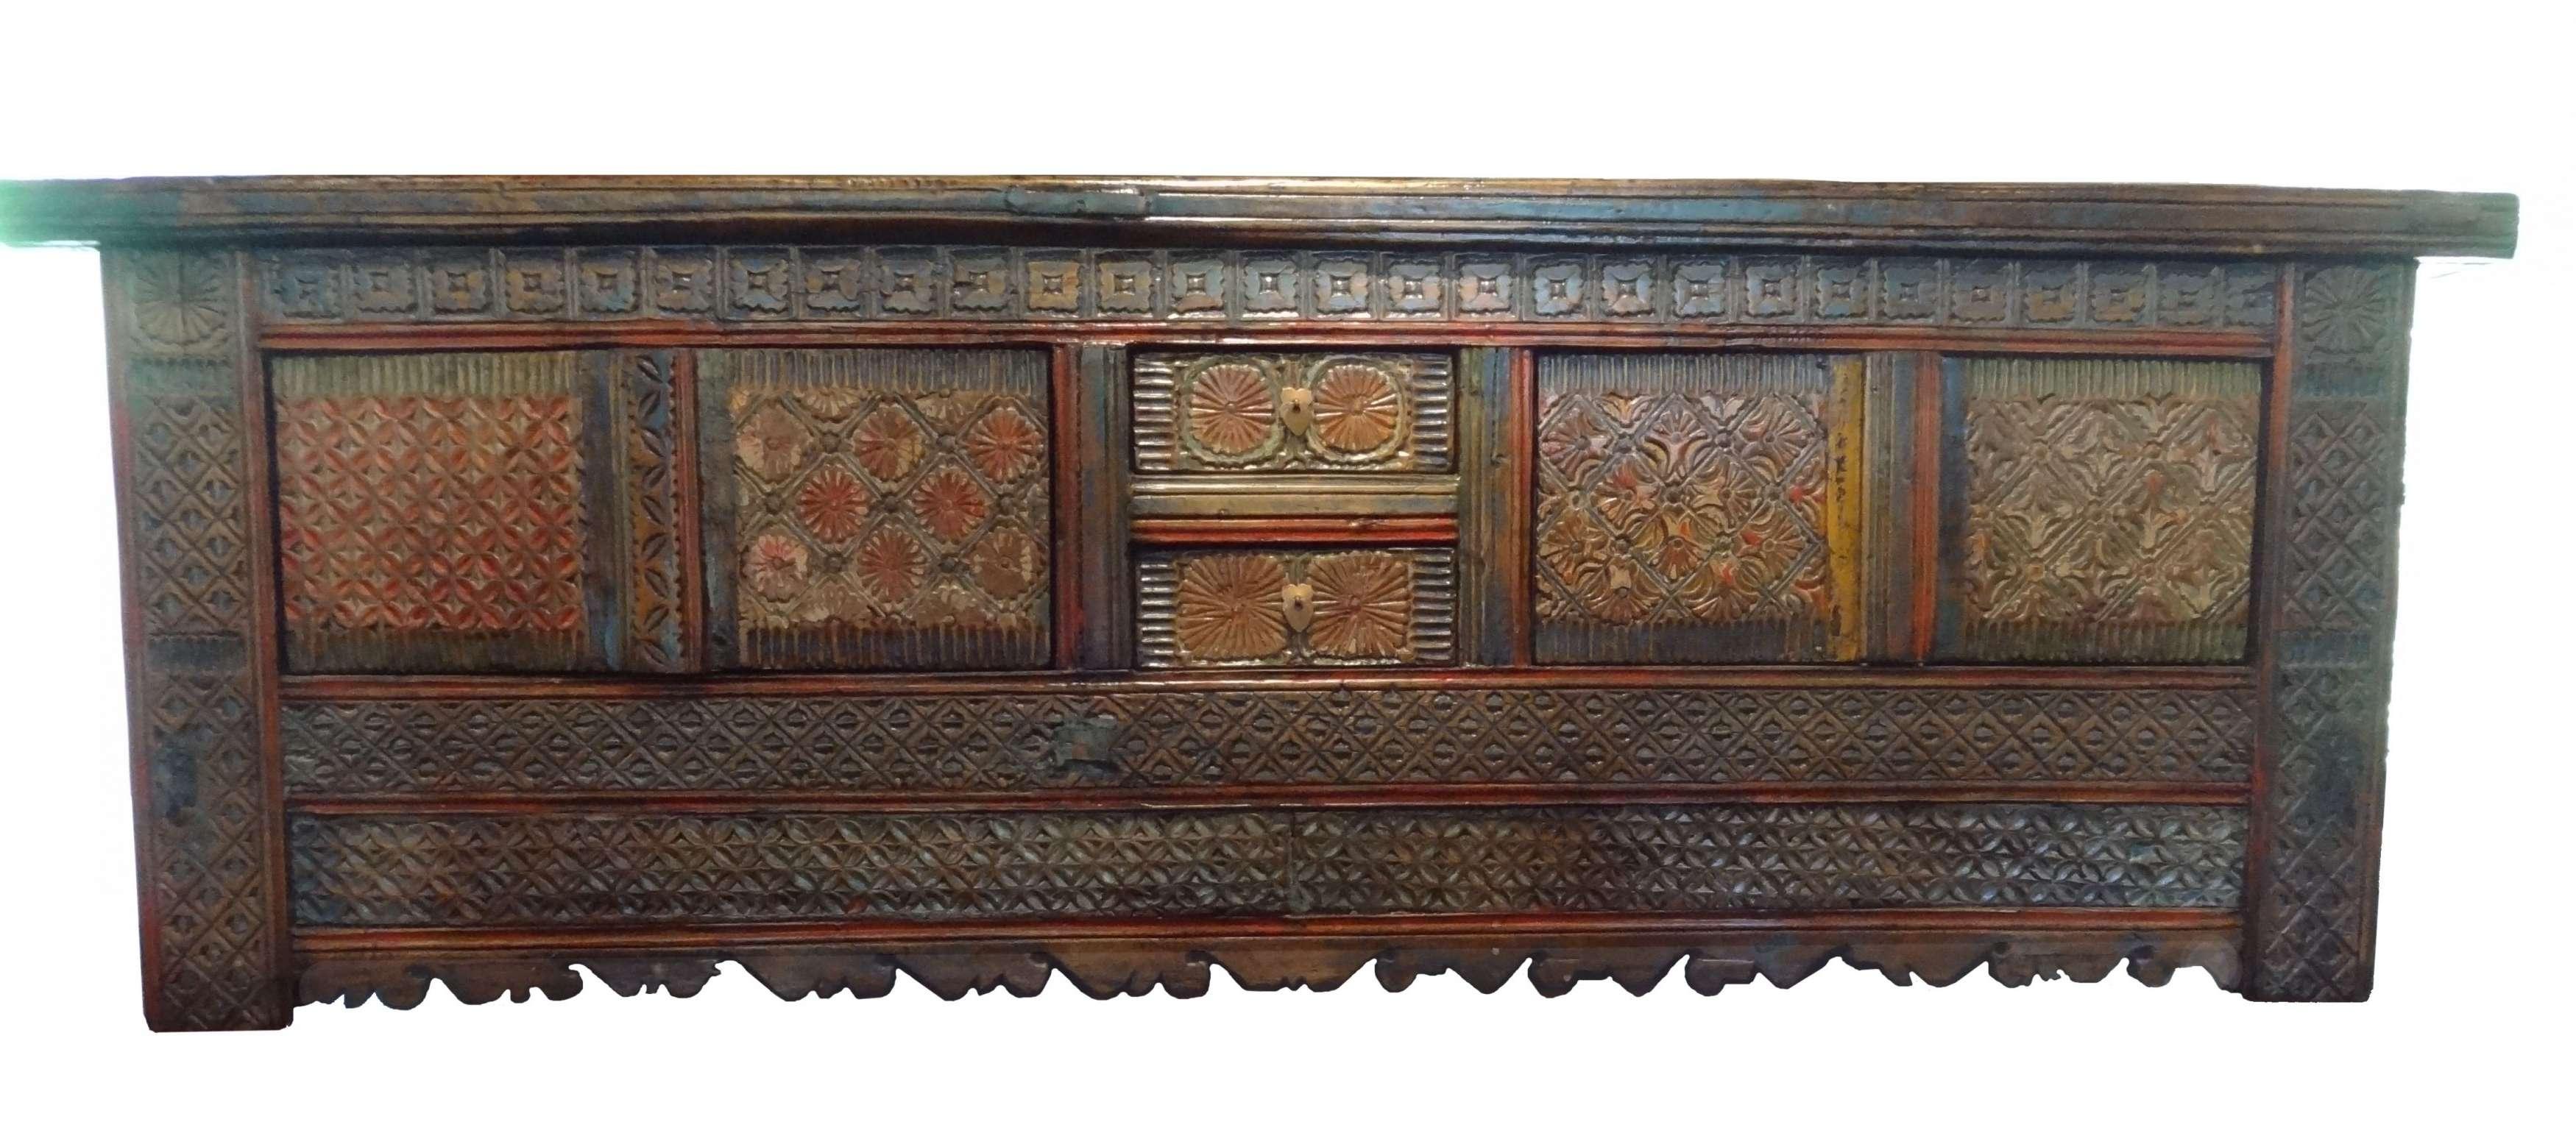 Antique Sideboards | Gallery Categories | Aptos Cruz Inside Antique Sideboards (View 5 of 20)